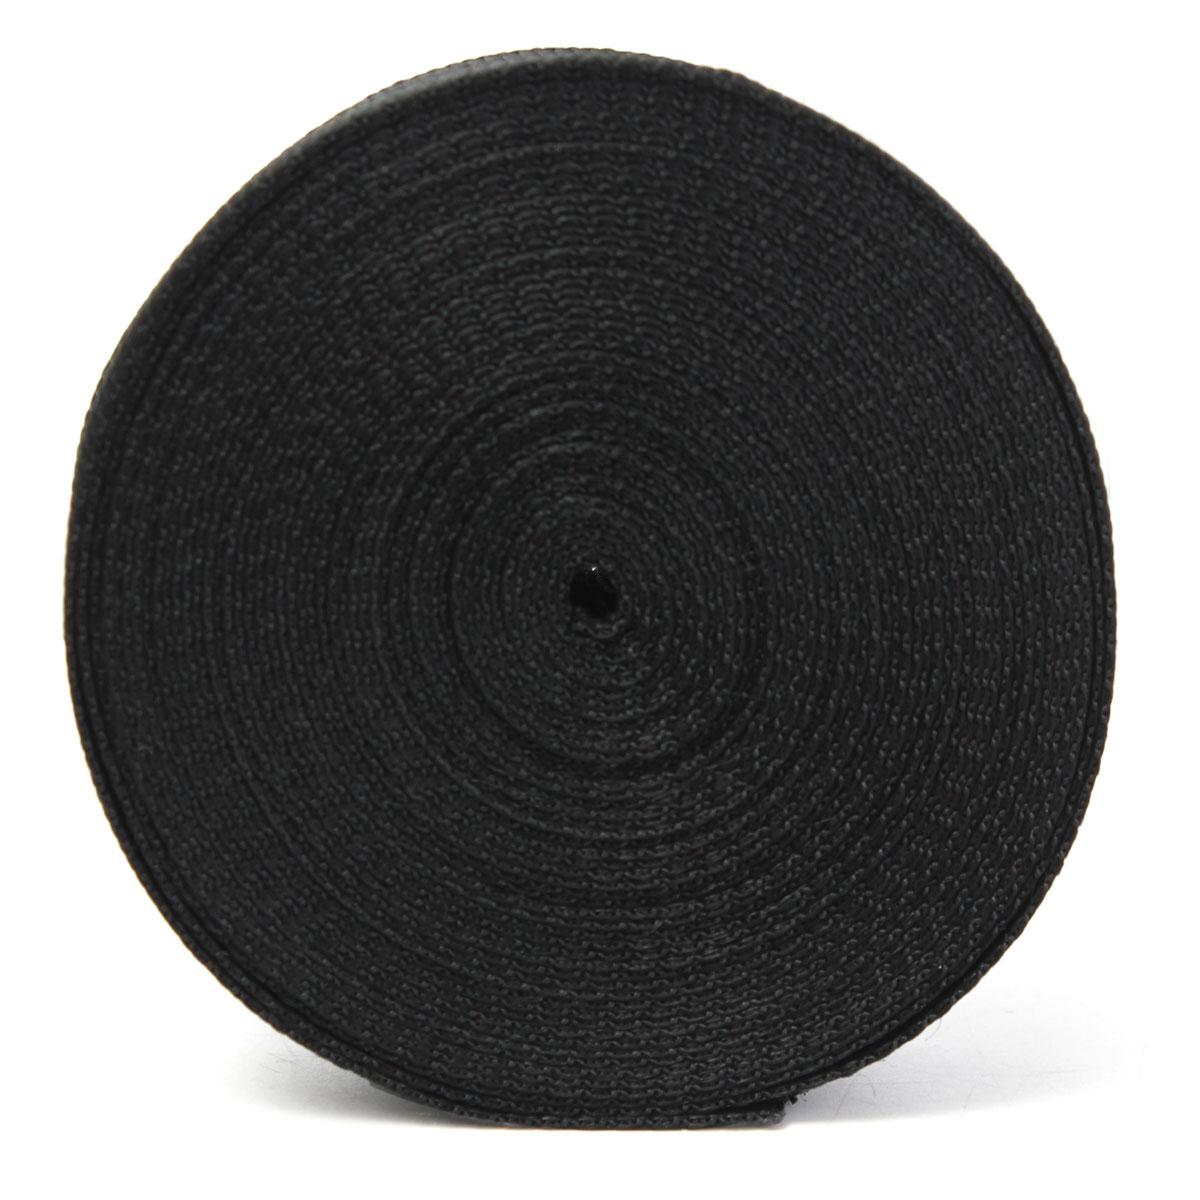 5cmx10m Black Nylon Fabric Webbing Tape For Making Strapping Belting Bag Strap